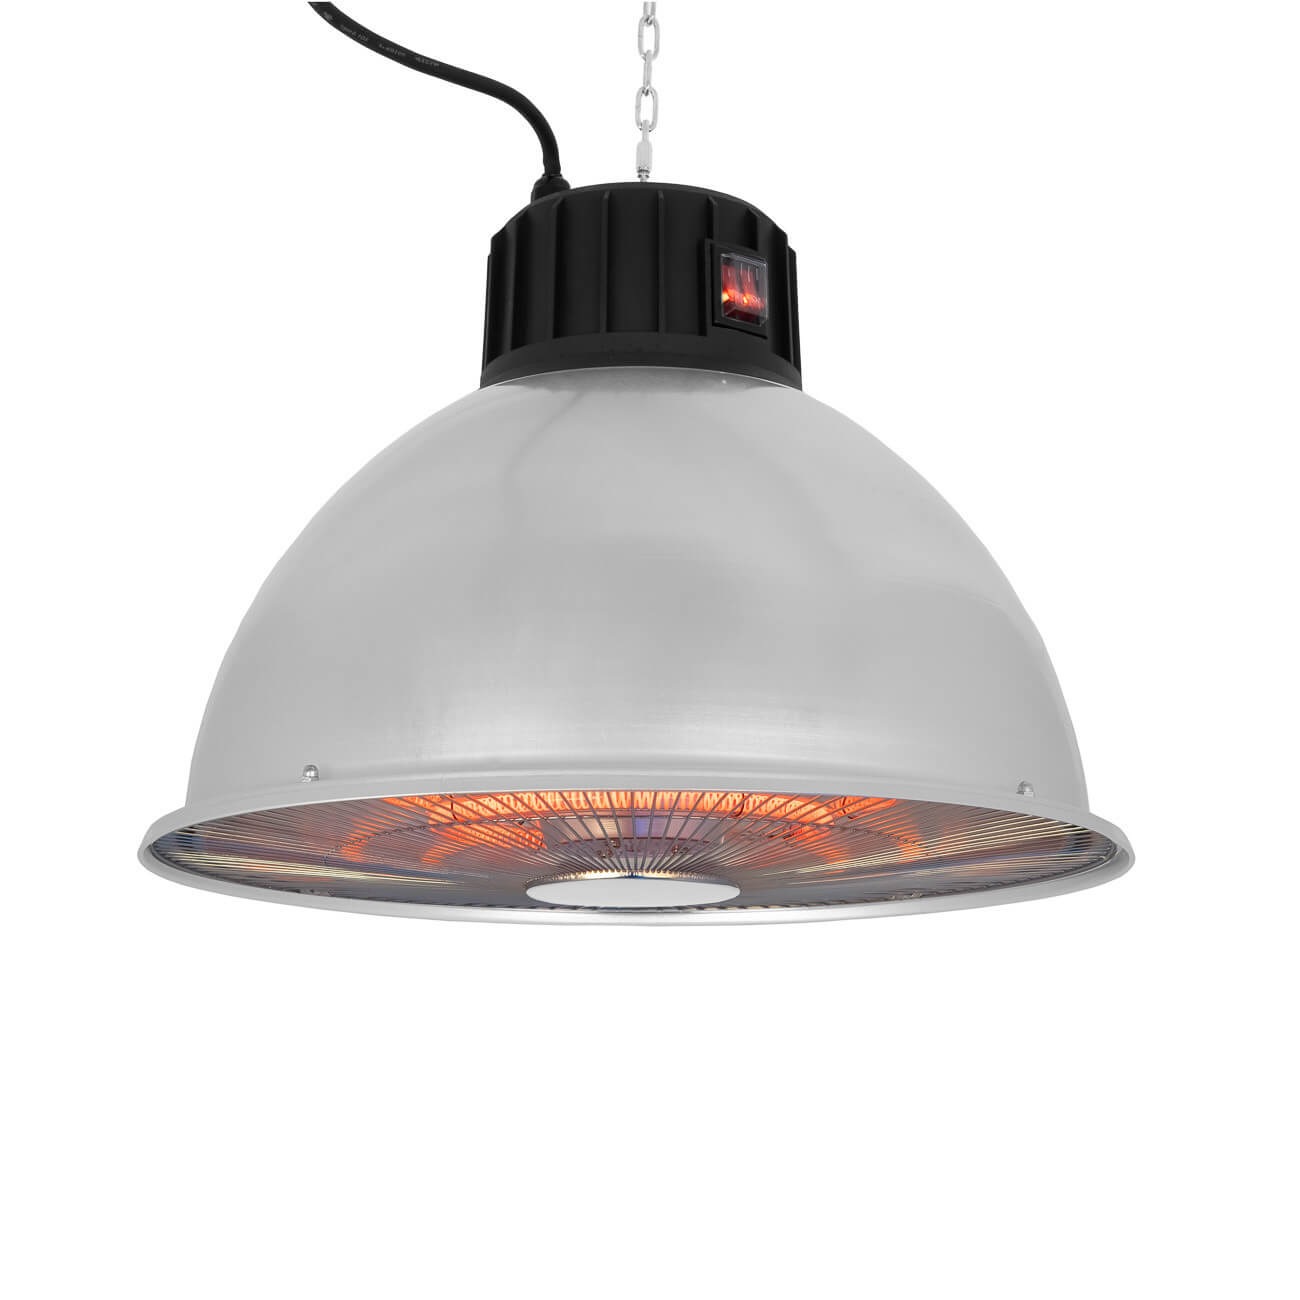 Eurom Partytent heater 1500 IND Carbon hangende infrarood terrasverwarmer D 42 cm